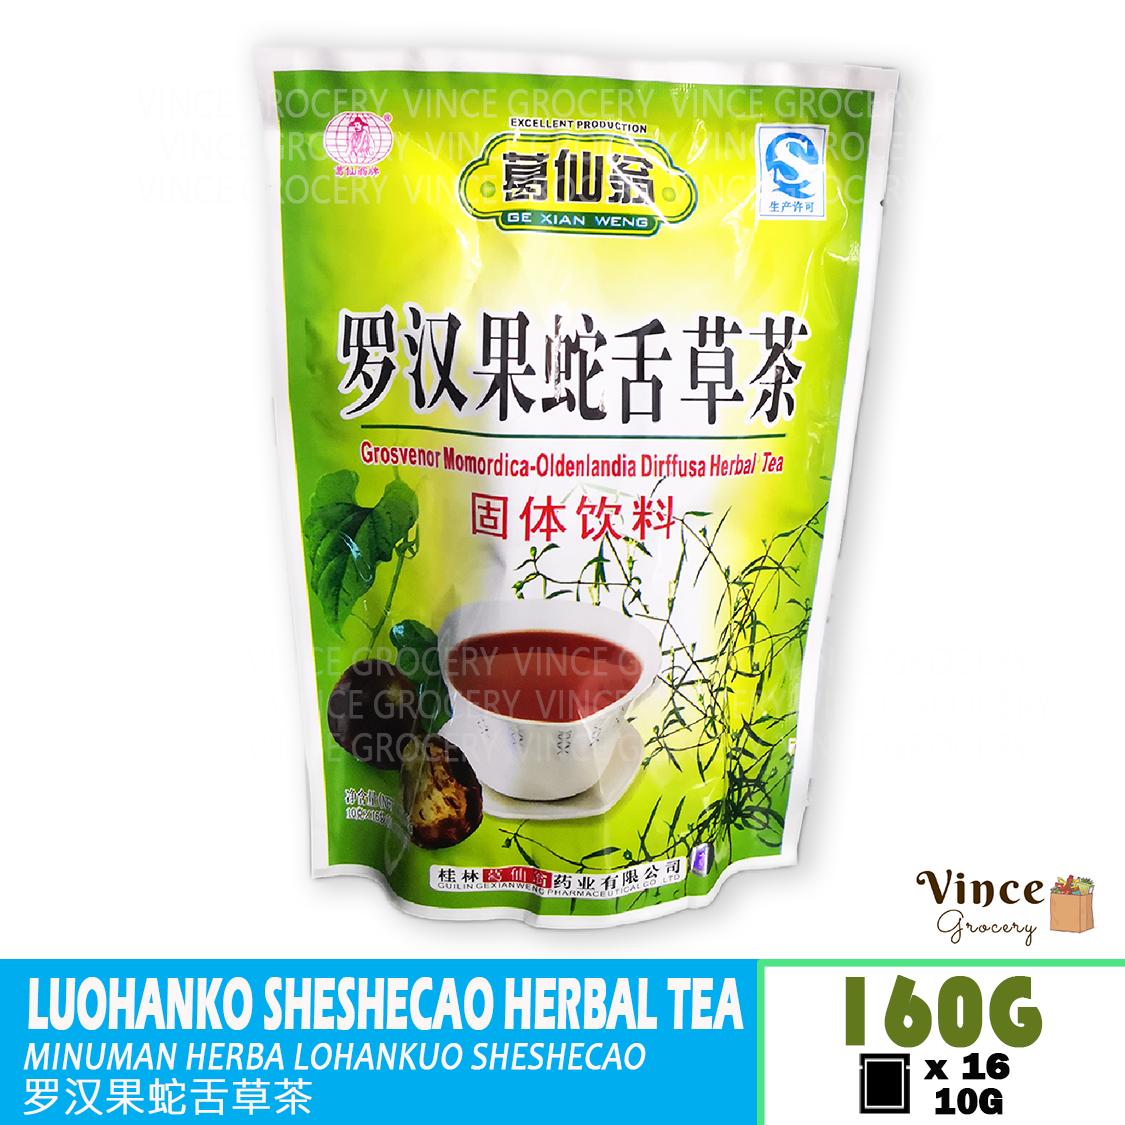 GE XIAN WENG Luohankuo Sheshecao Herbal Tea  葛仙翁罗汉果蛇舌草茶 160G (16's x 10G)